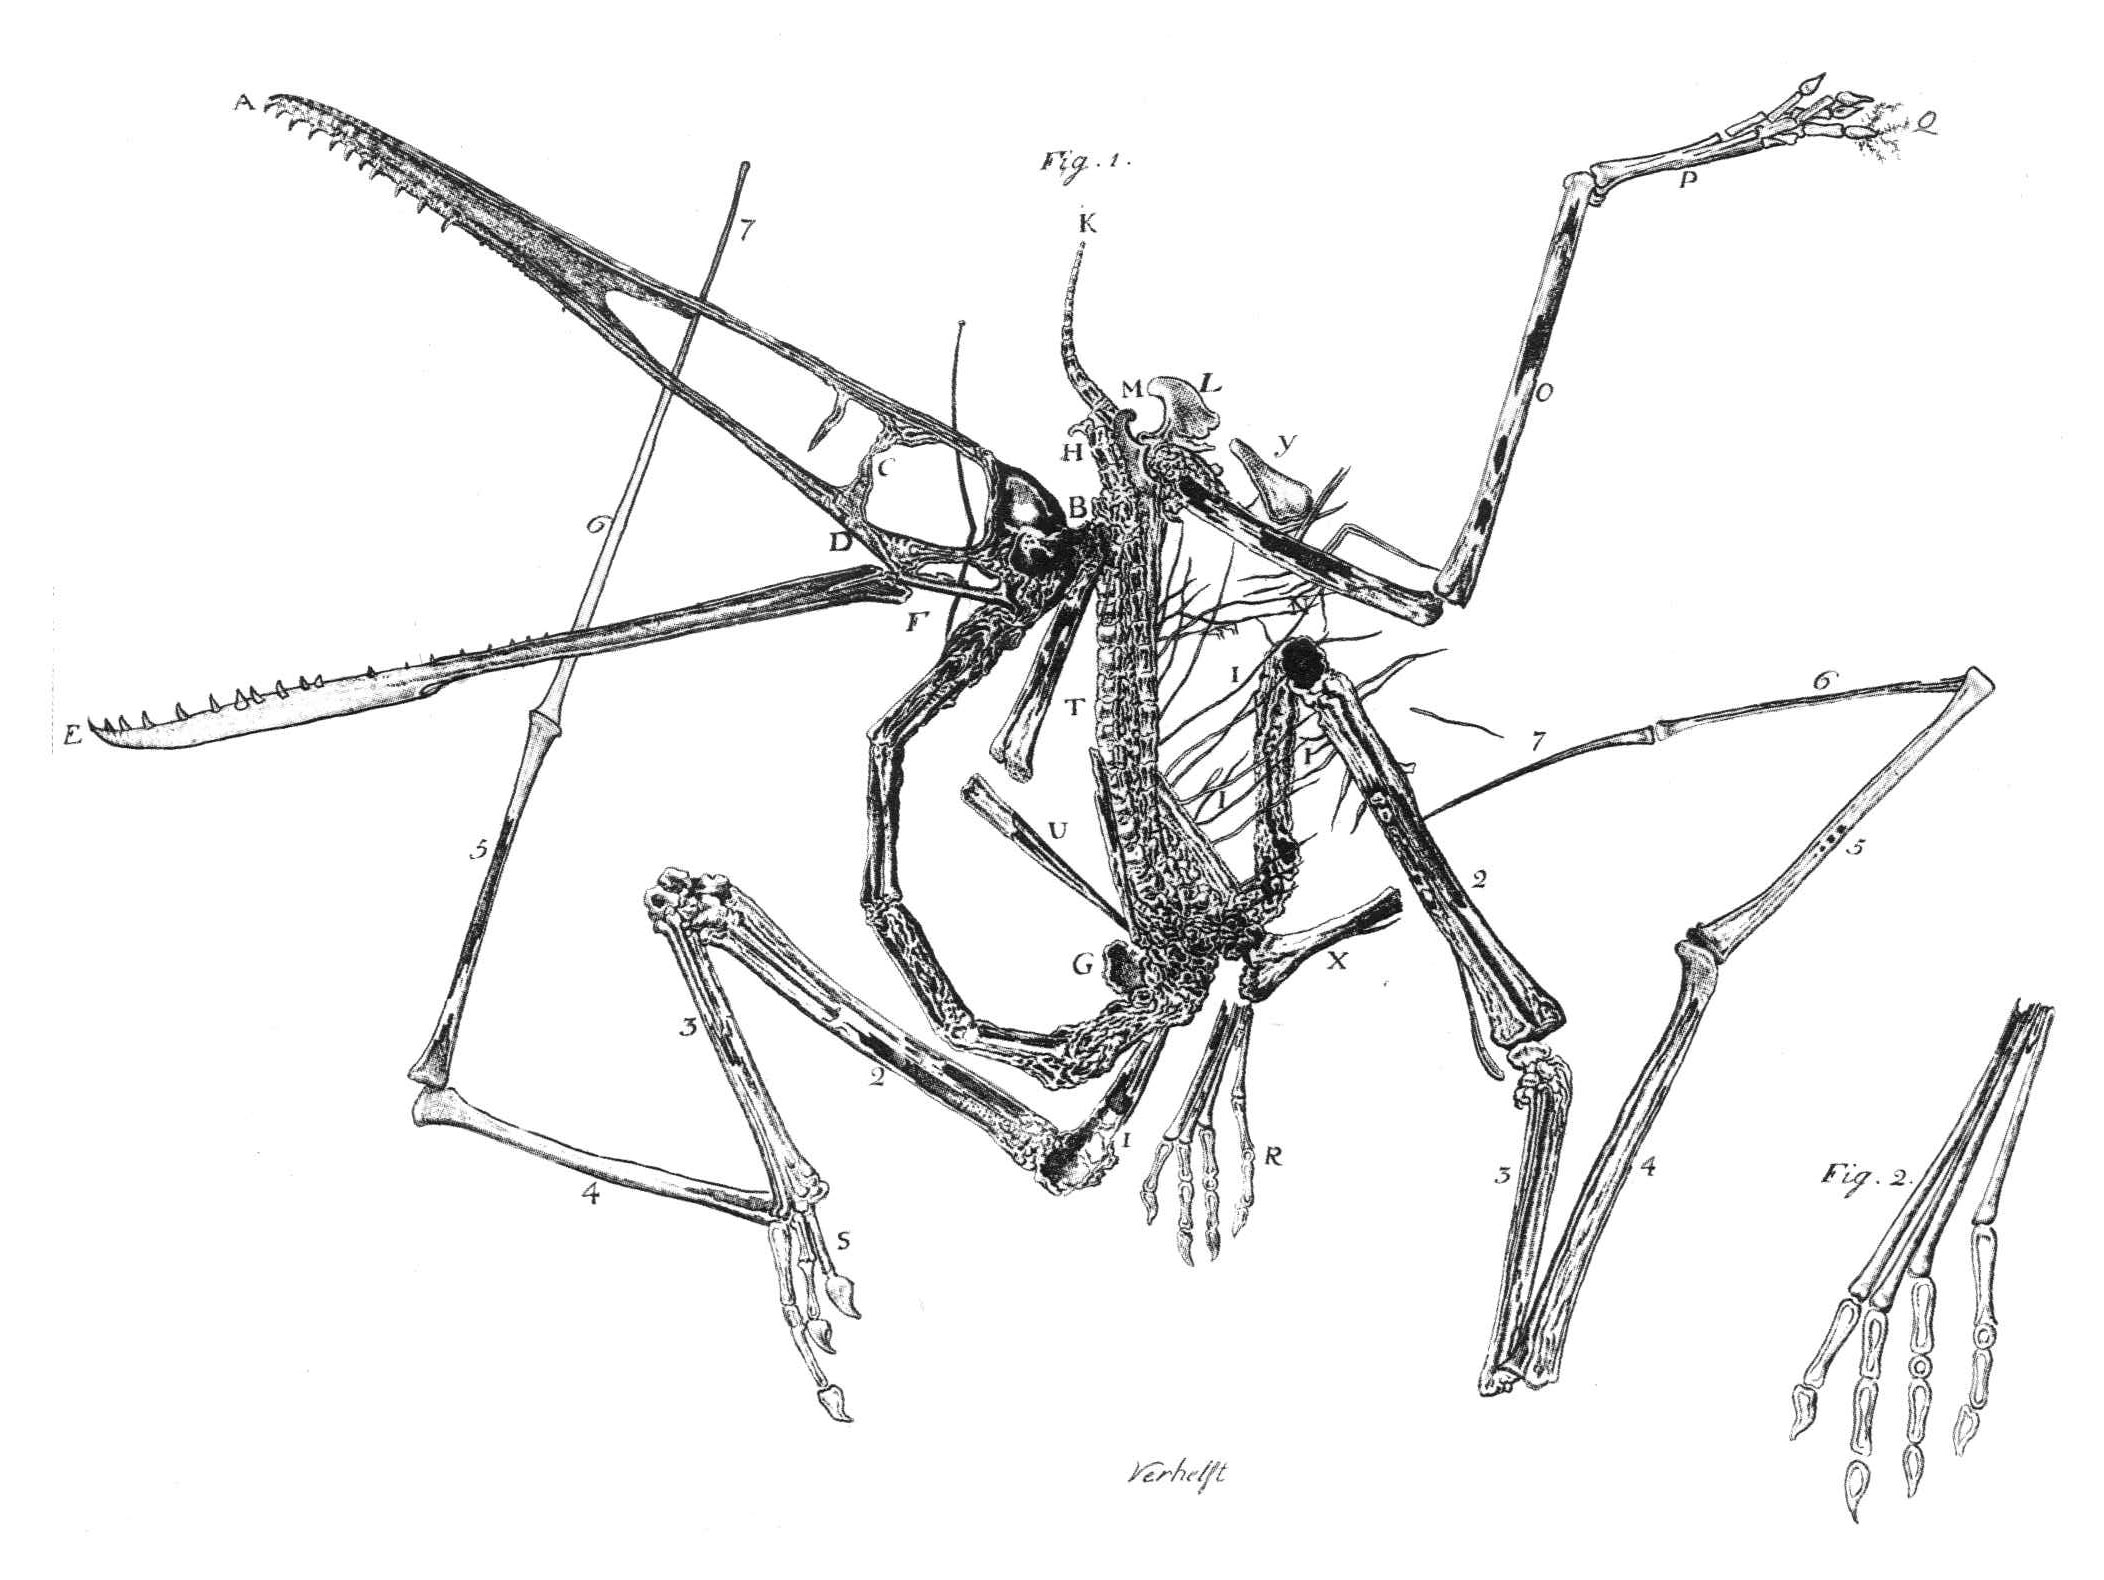 http://upload.wikimedia.org/wikipedia/commons/c/cf/Pterodactylus_holotype_Collini_1784.jpg